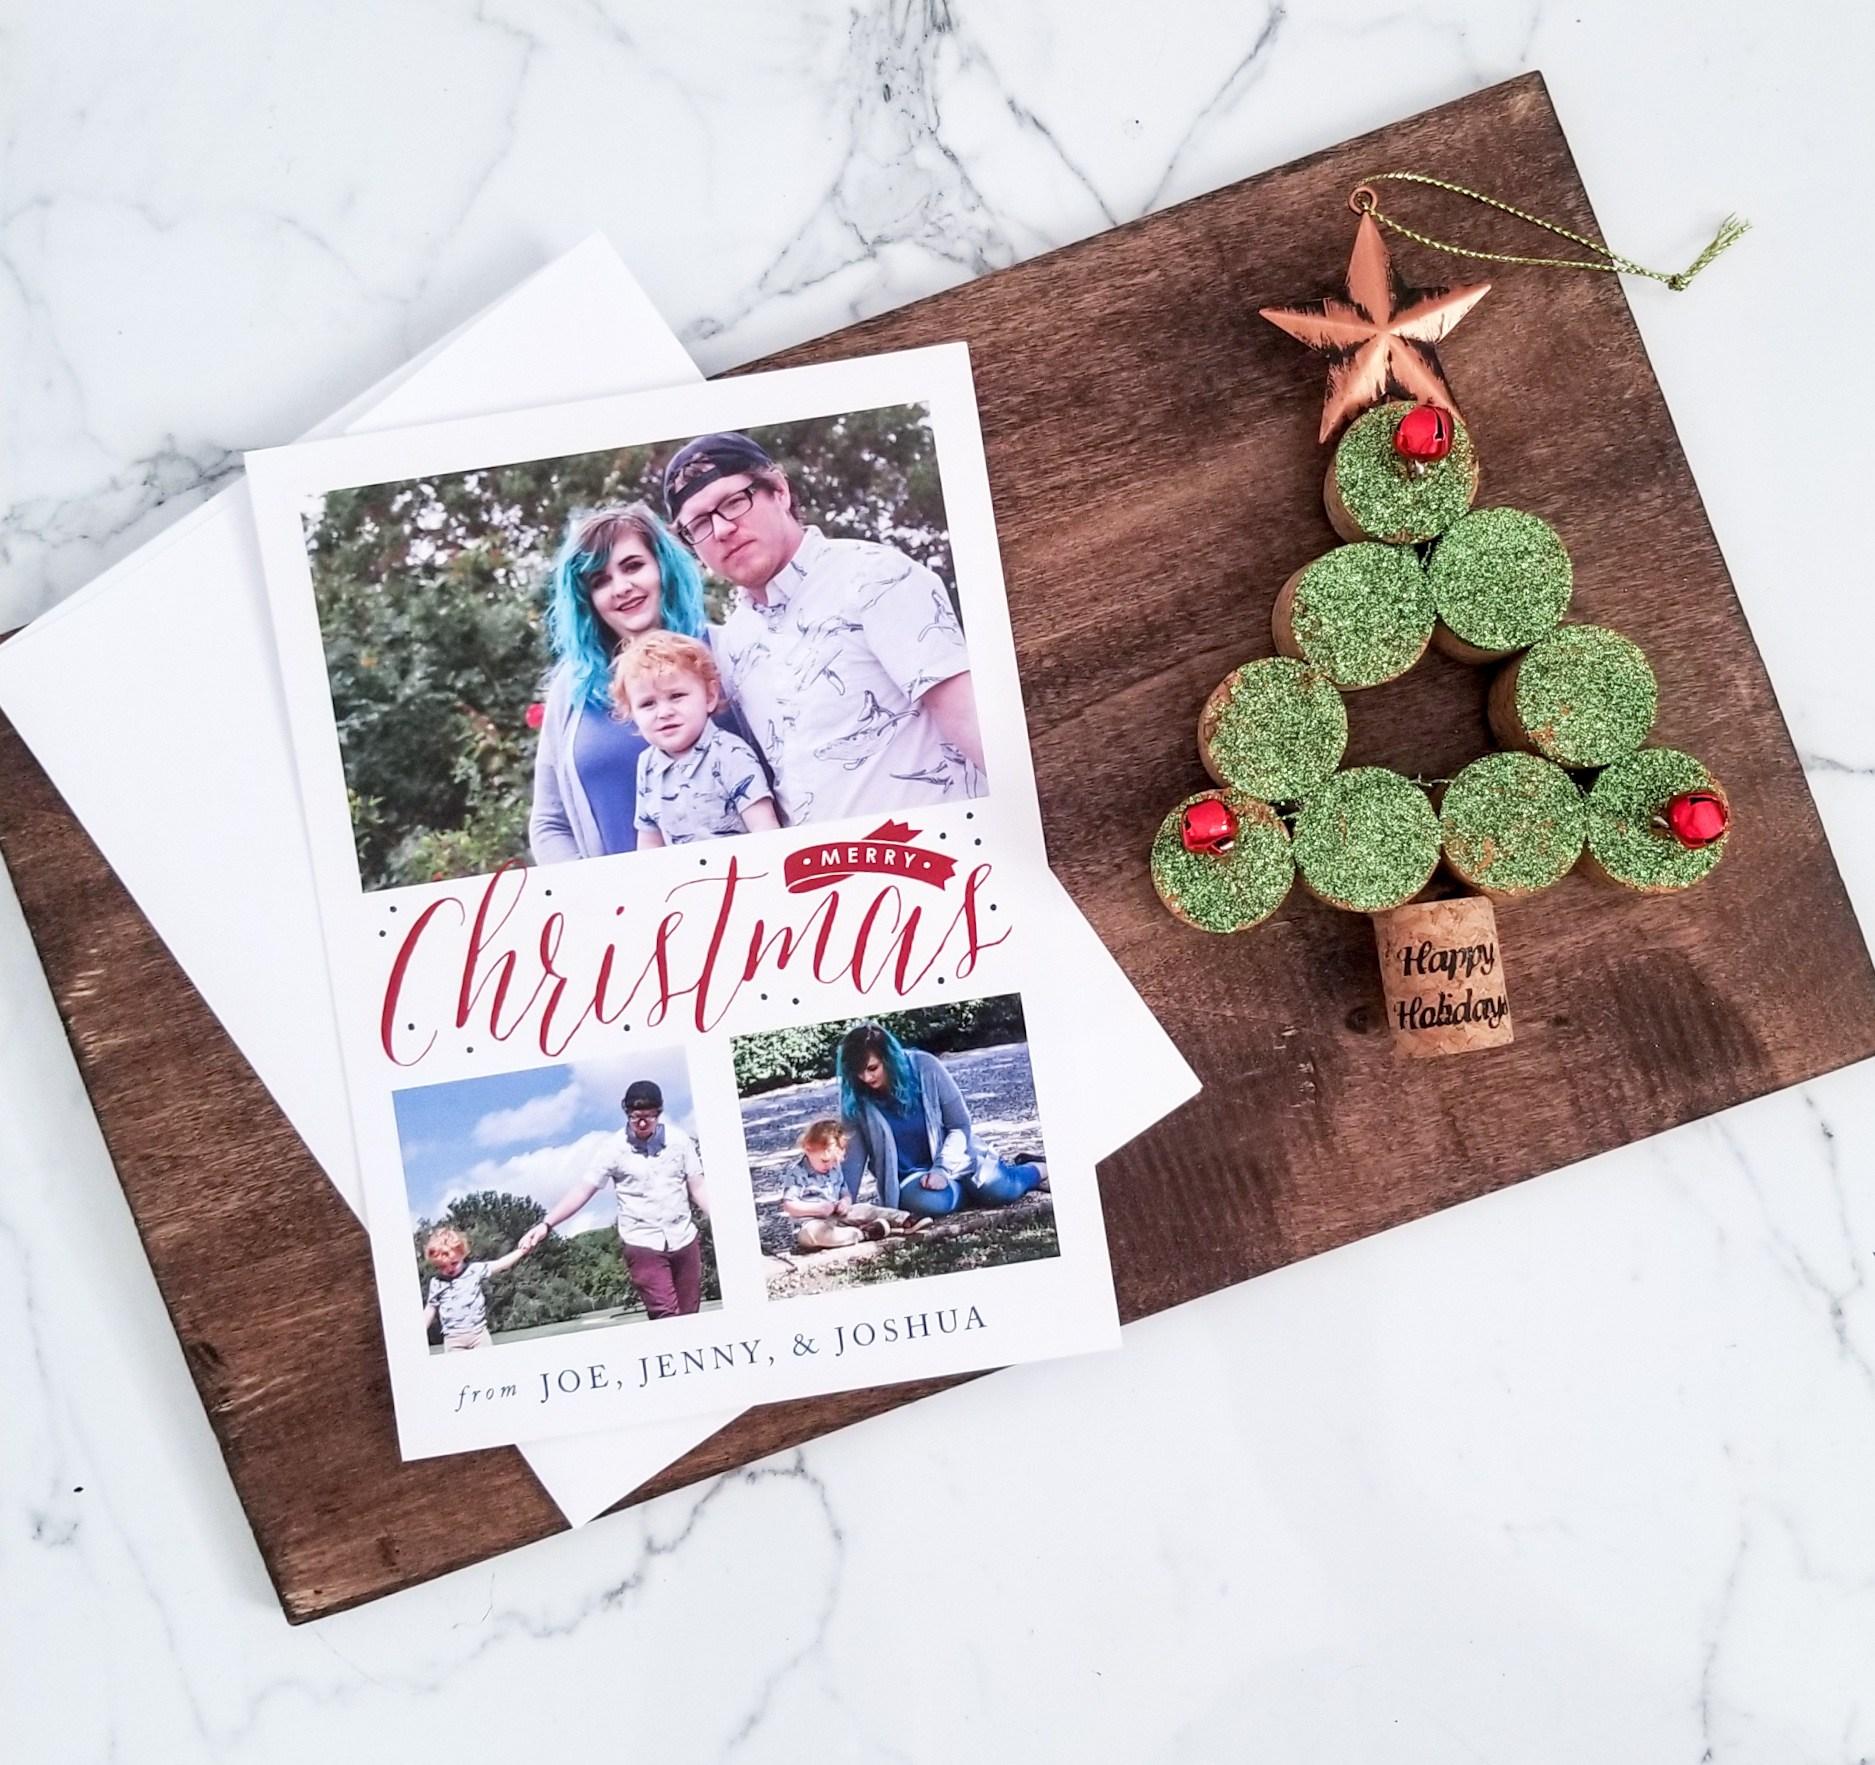 @thebrockblog's cover photo for 'Send Some Joy This Holiday Season - The Brock Blog'